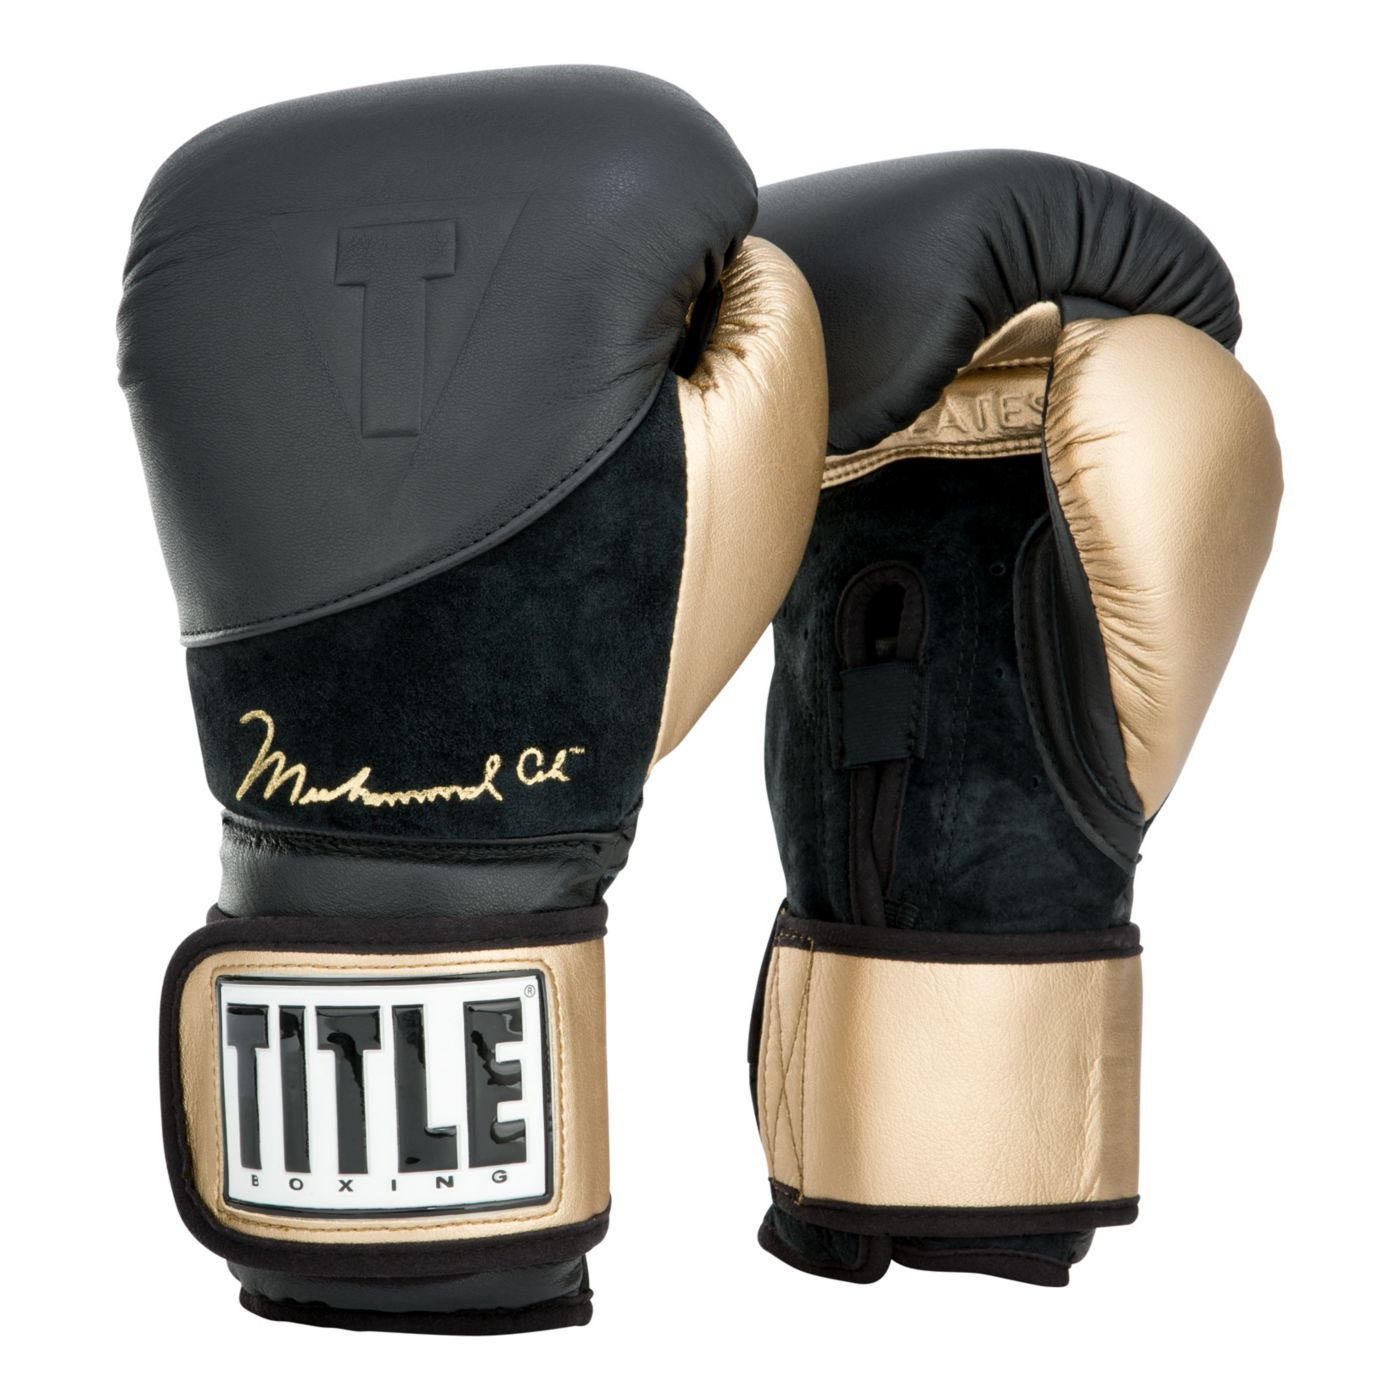 TITLE Ali Legacy Heavy Bag Gloves